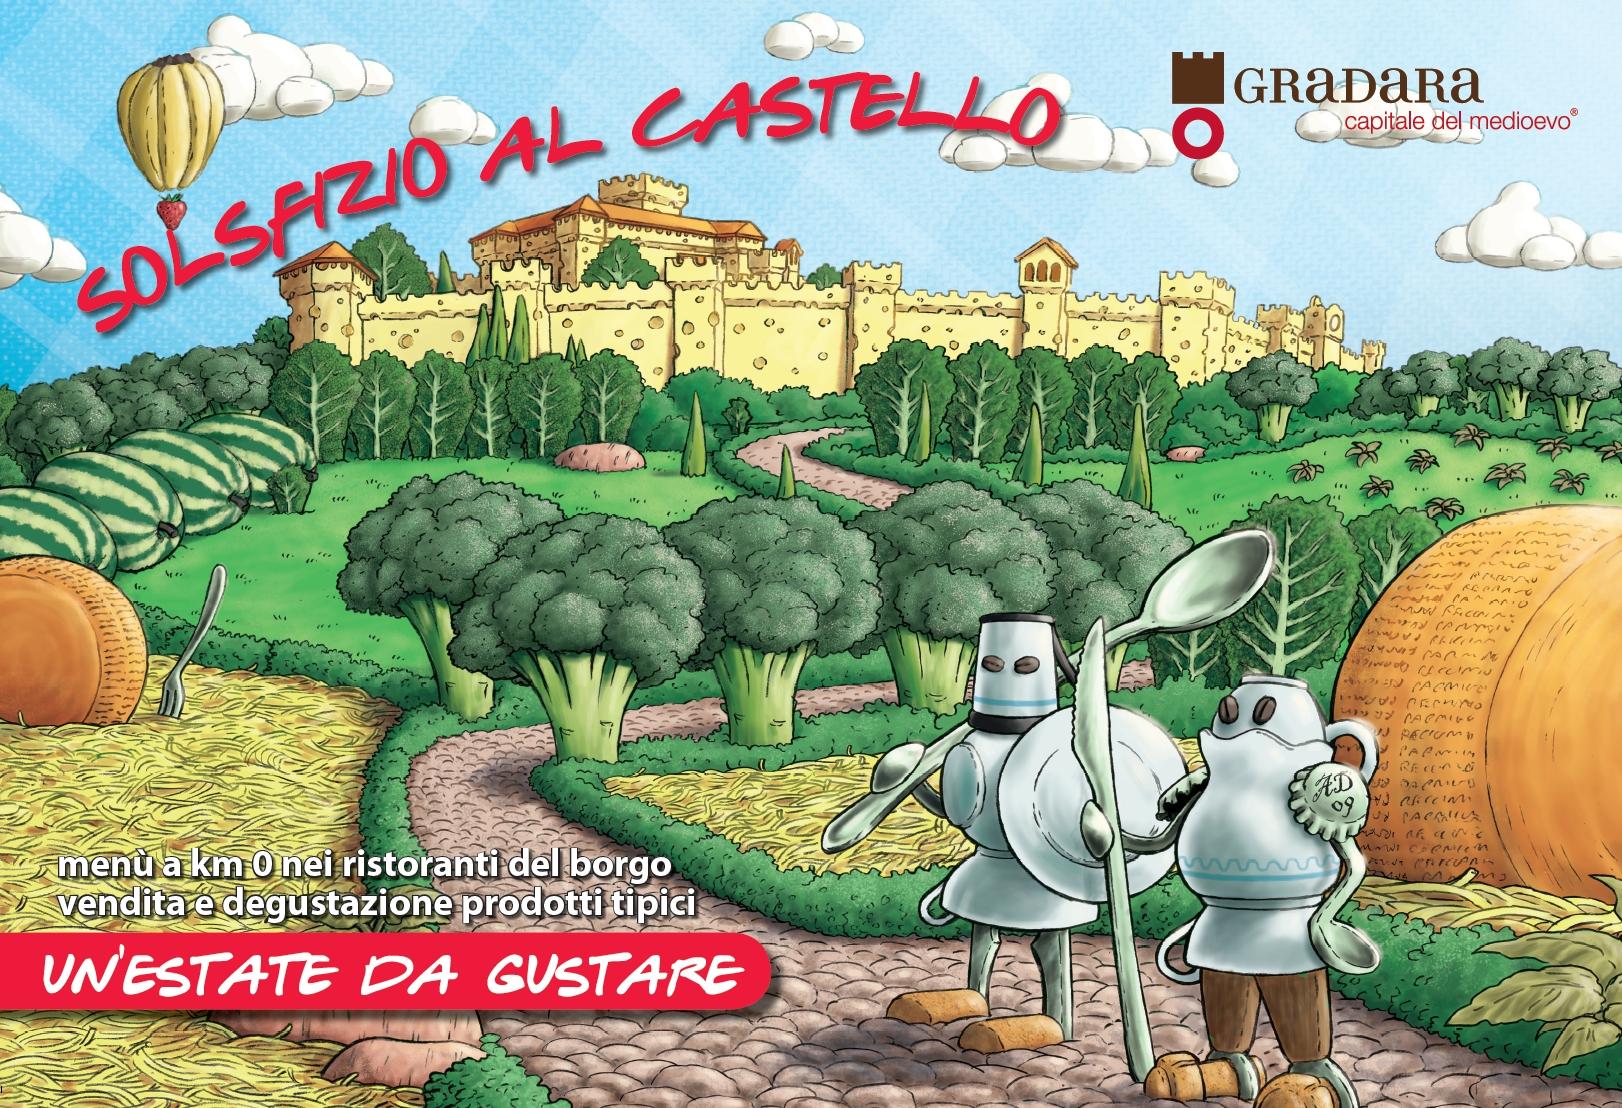 Логотип праздника Solsfizio al Castello